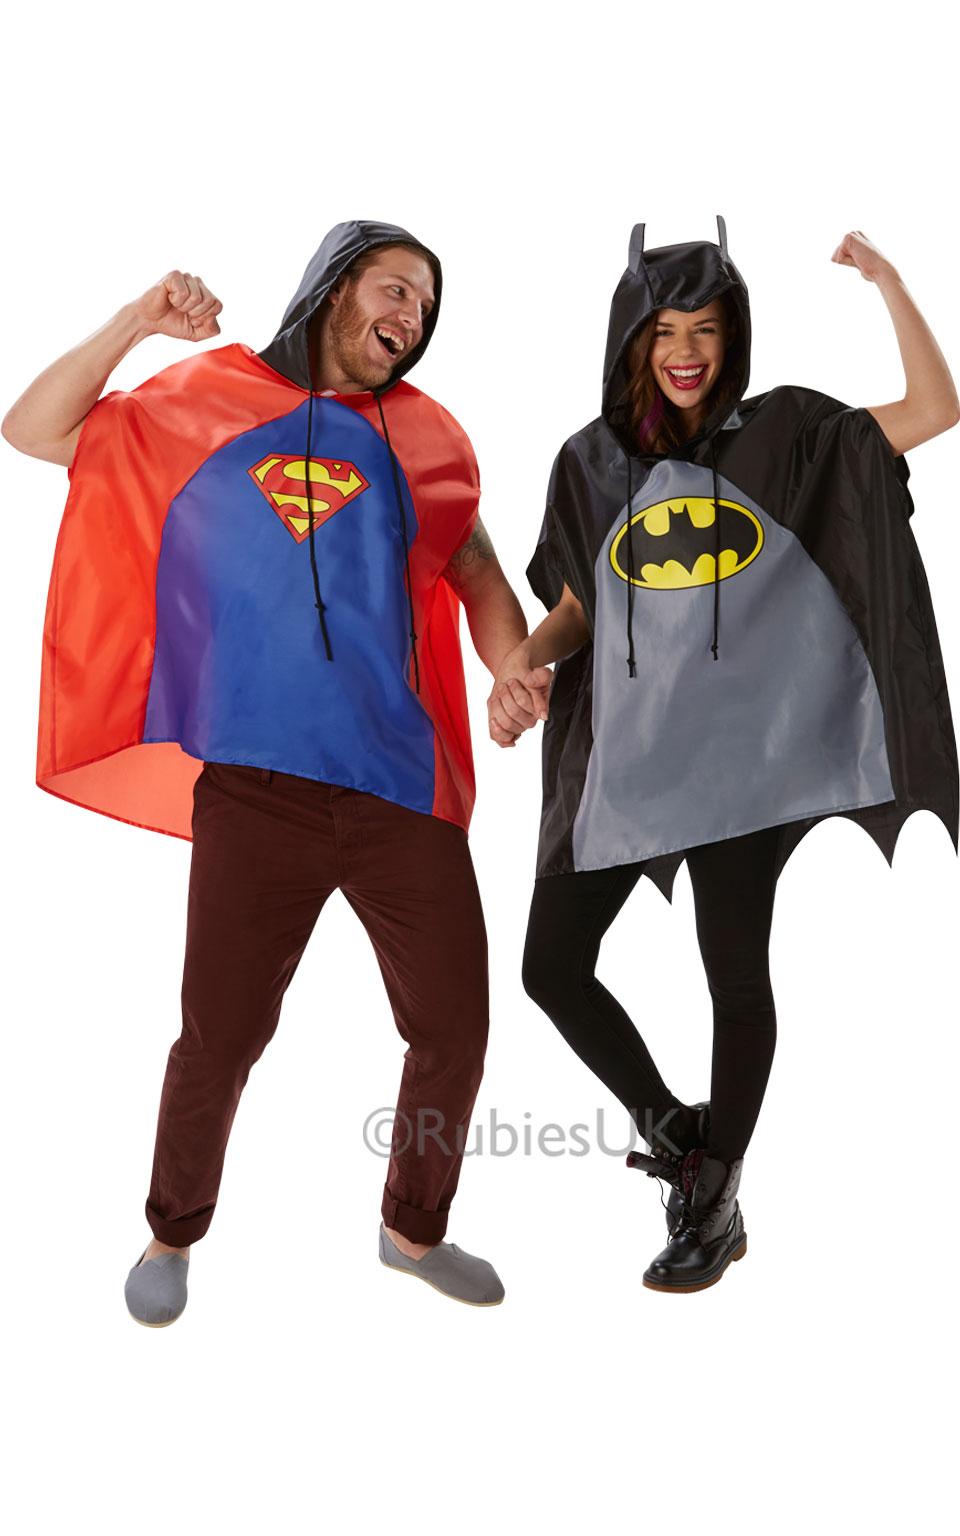 Sentinel Superman Or Batman Poncho Adults Fancy Dress Comic Superhero Mens Ladies Costume  sc 1 st  eBay & Superman Or Batman Poncho Adults Fancy Dress Comic Superhero Mens ...